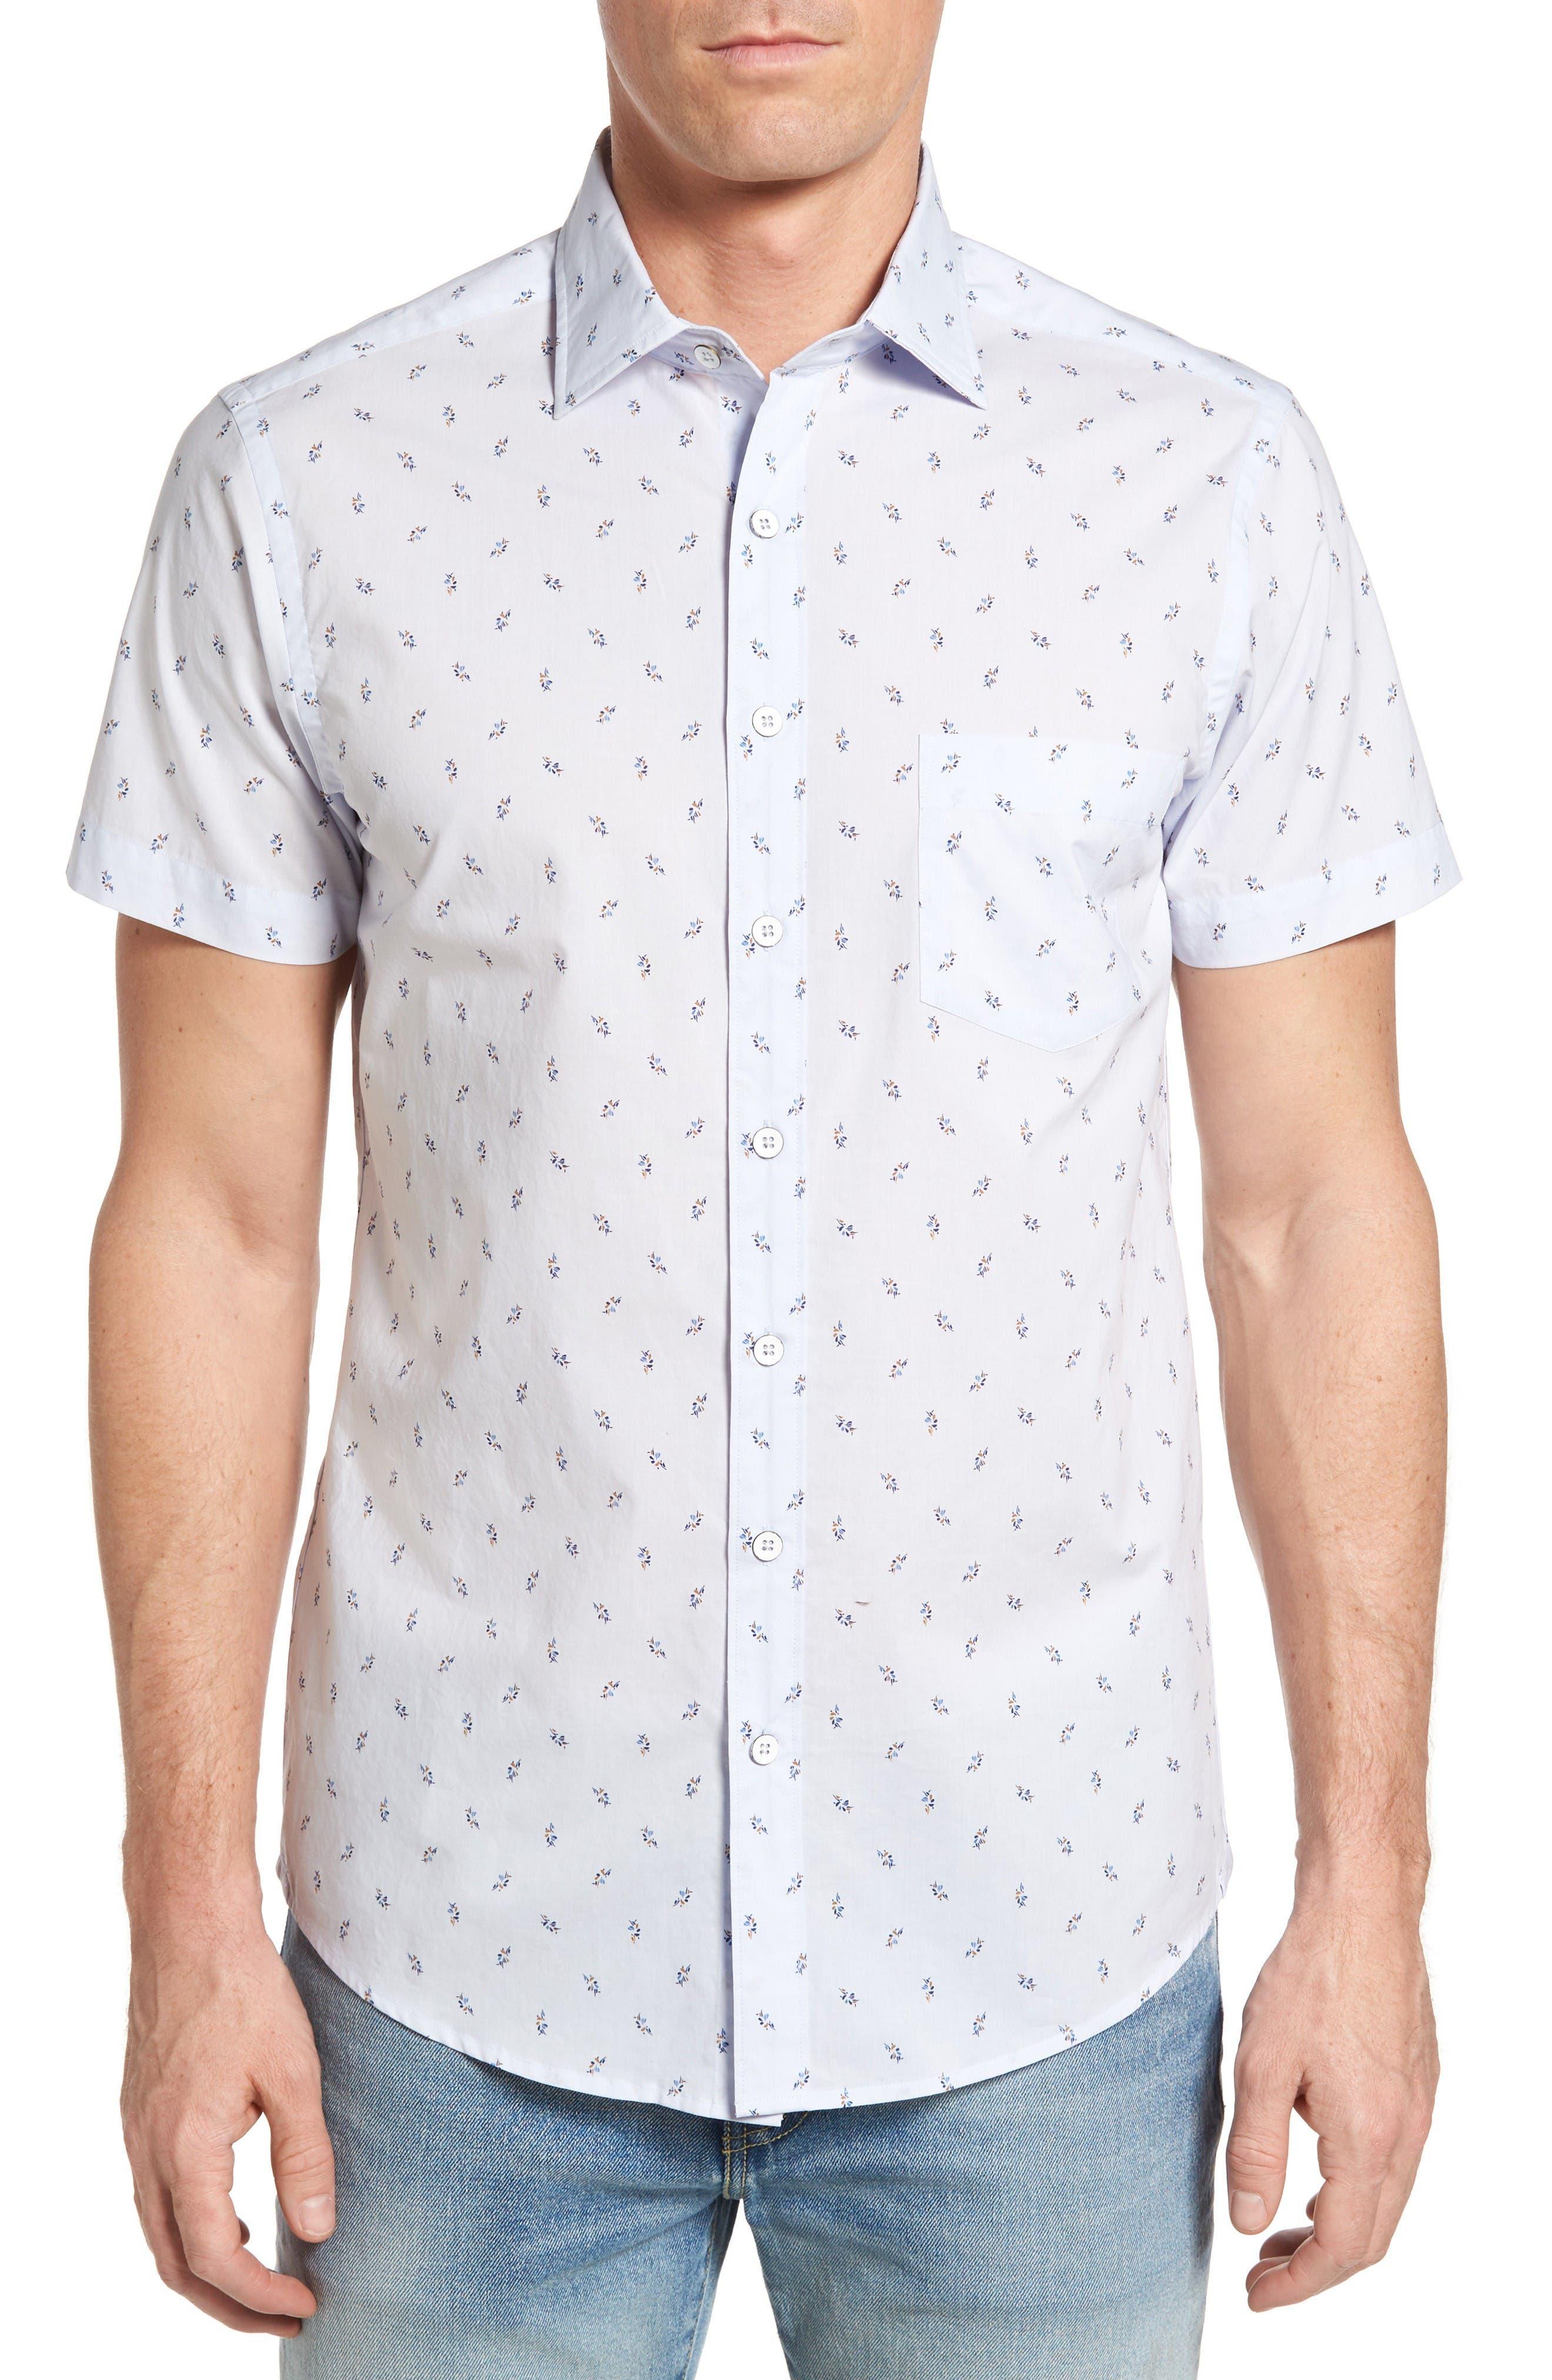 Waterfront Sport Shirt,                         Main,                         color, Powder Blue